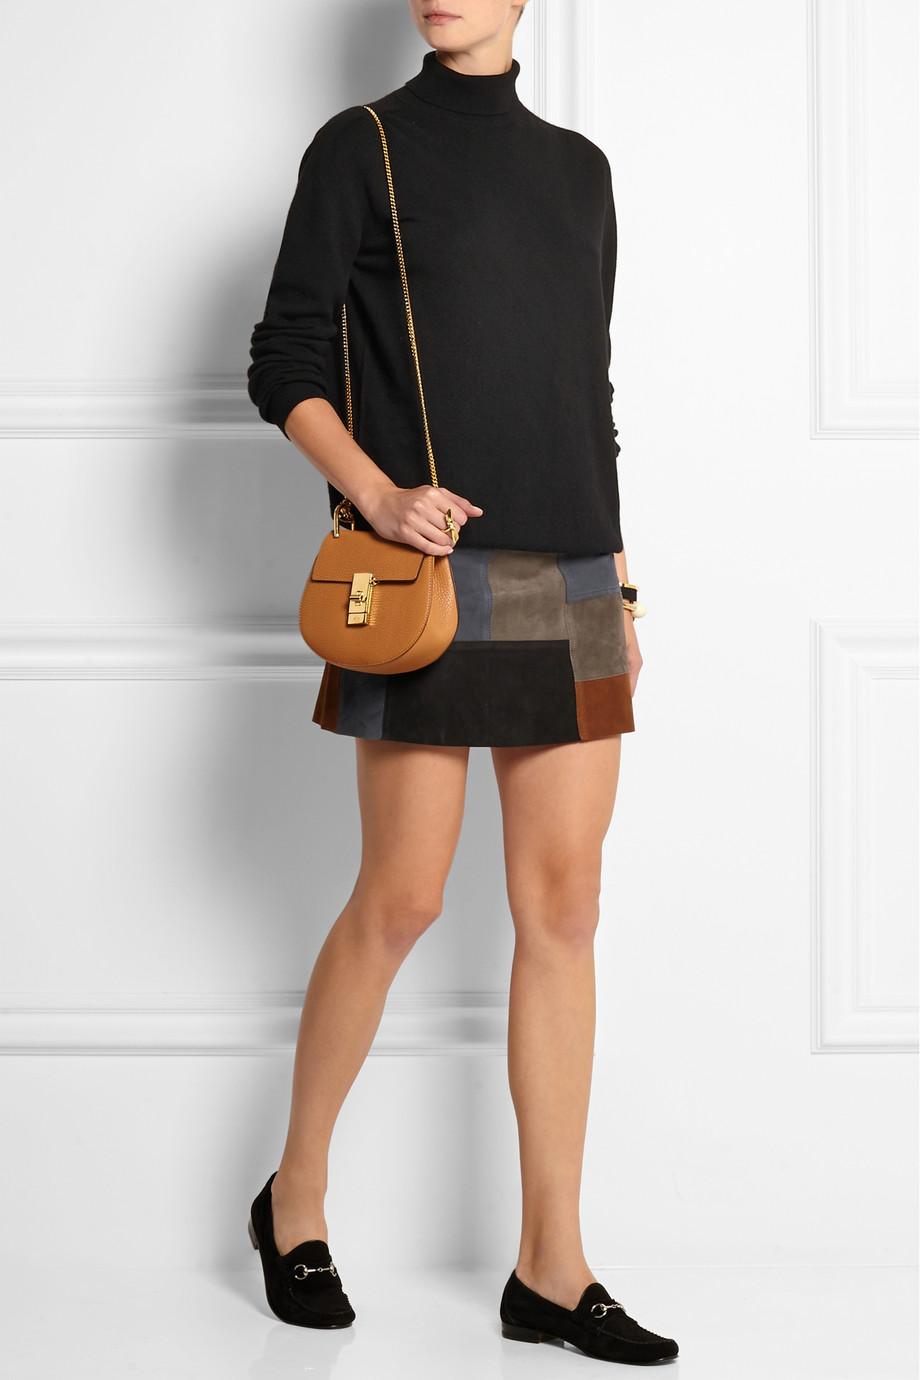 a turtleneck and mini skirt